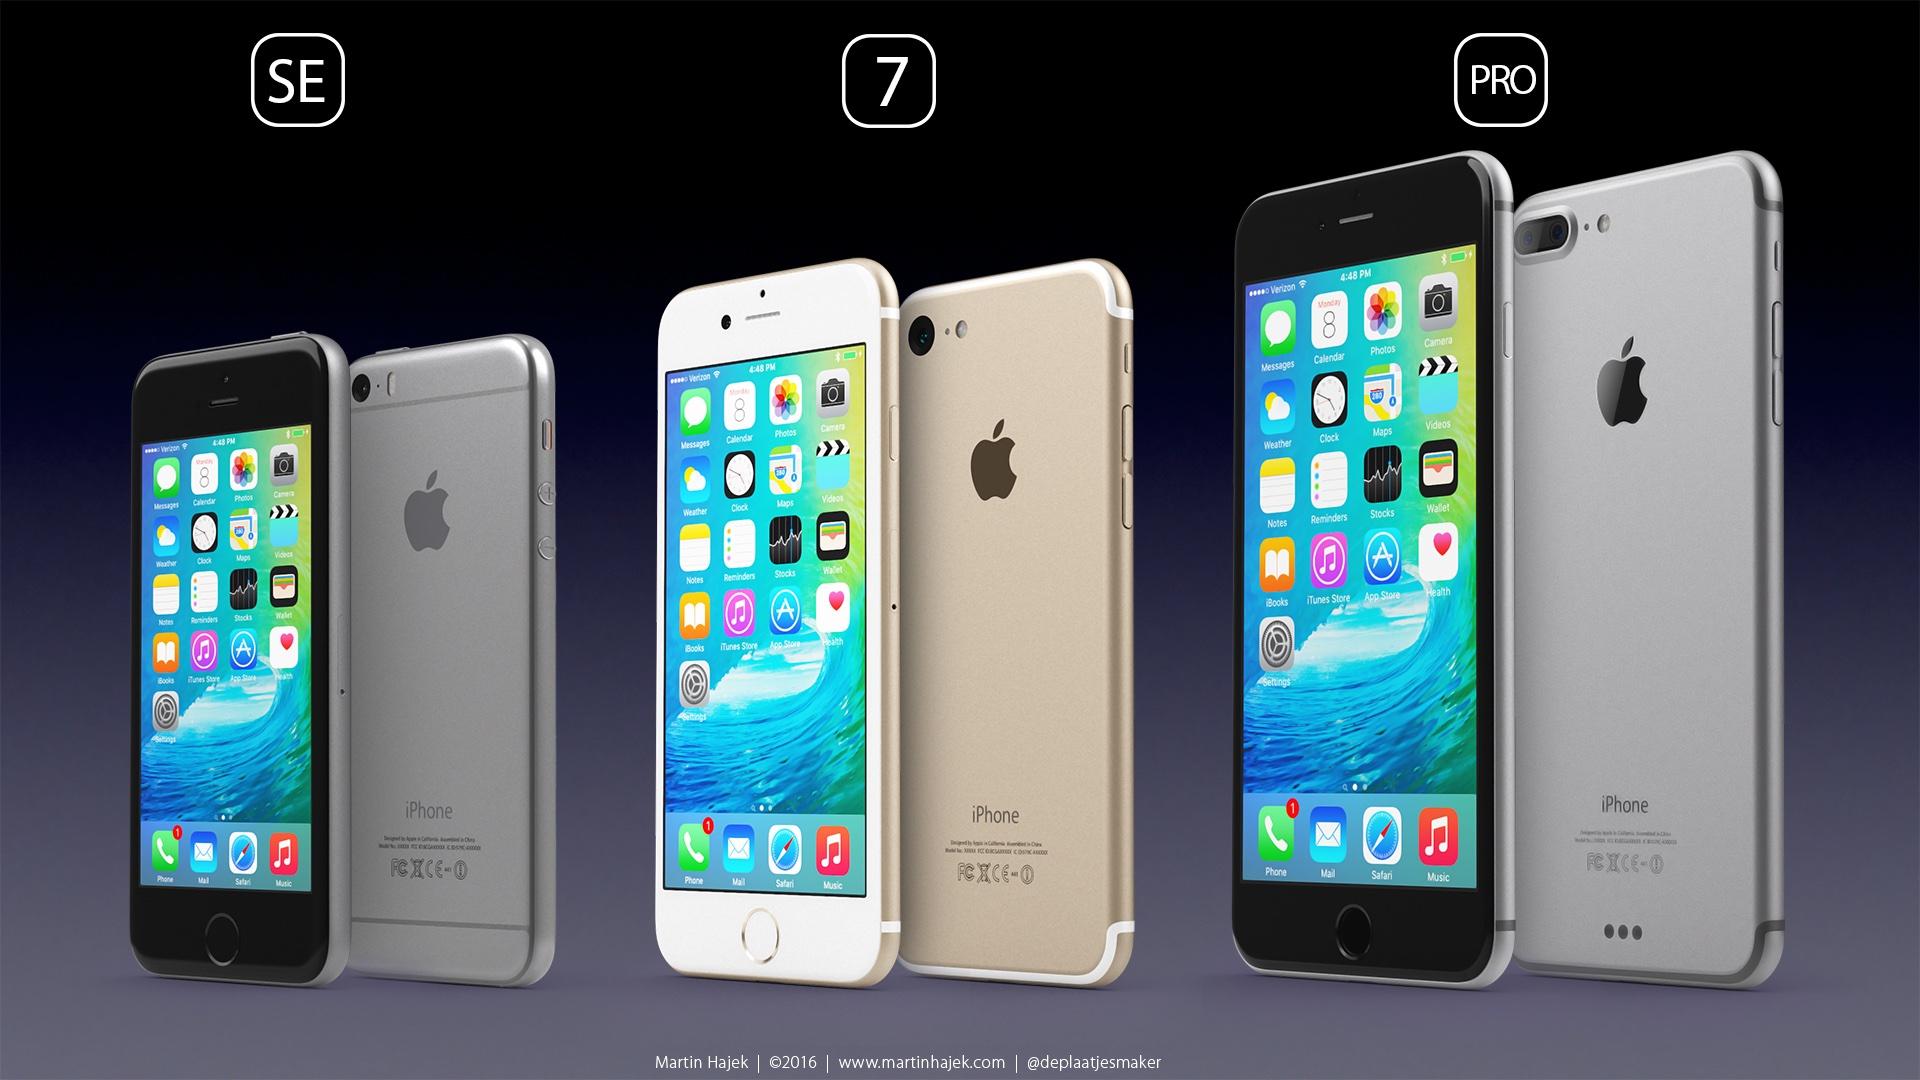 Martin Hajek Concept iPhone se iPhone 7 iPhone Pro image 001